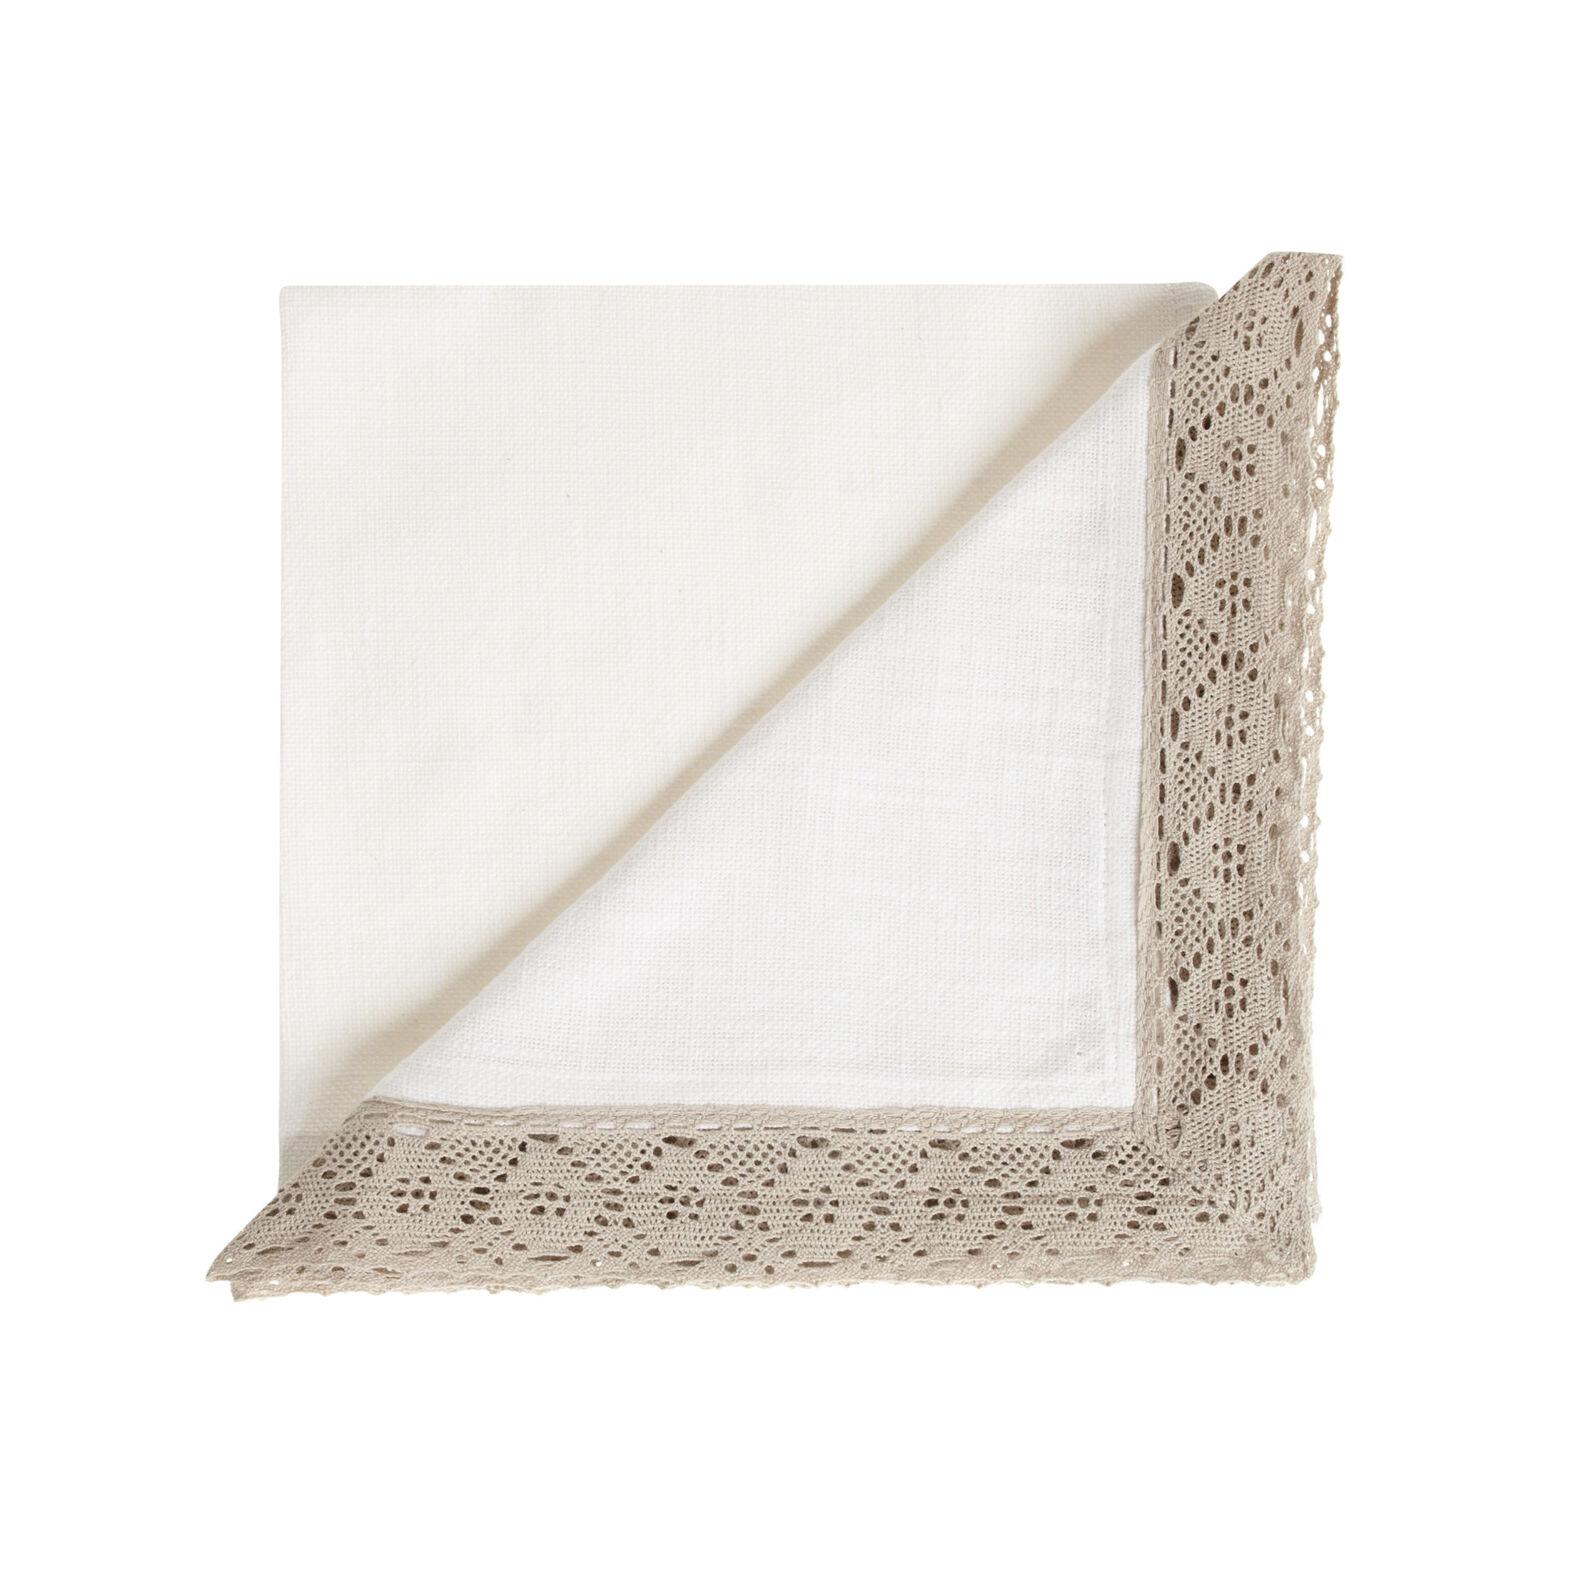 Burano Lace napkin